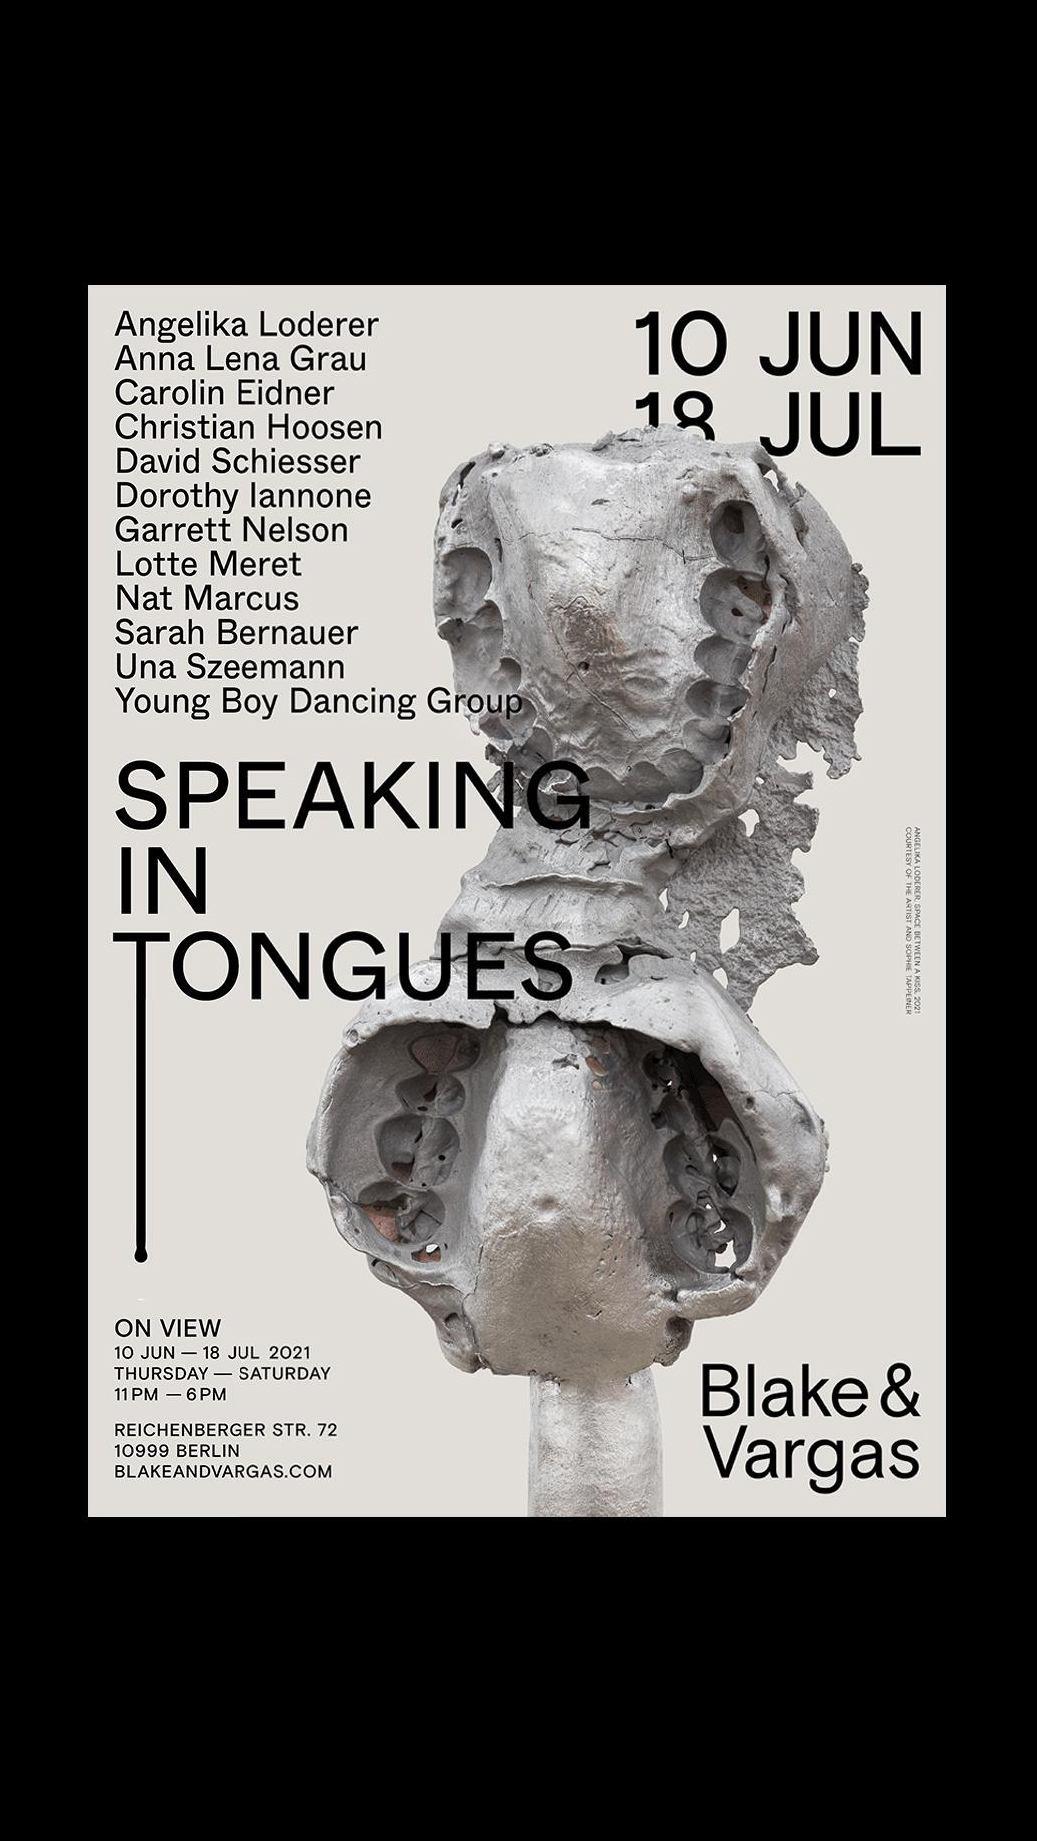 <p>Speaking in Tongues – Upcoming exhibition at Blake & Vargas</p>